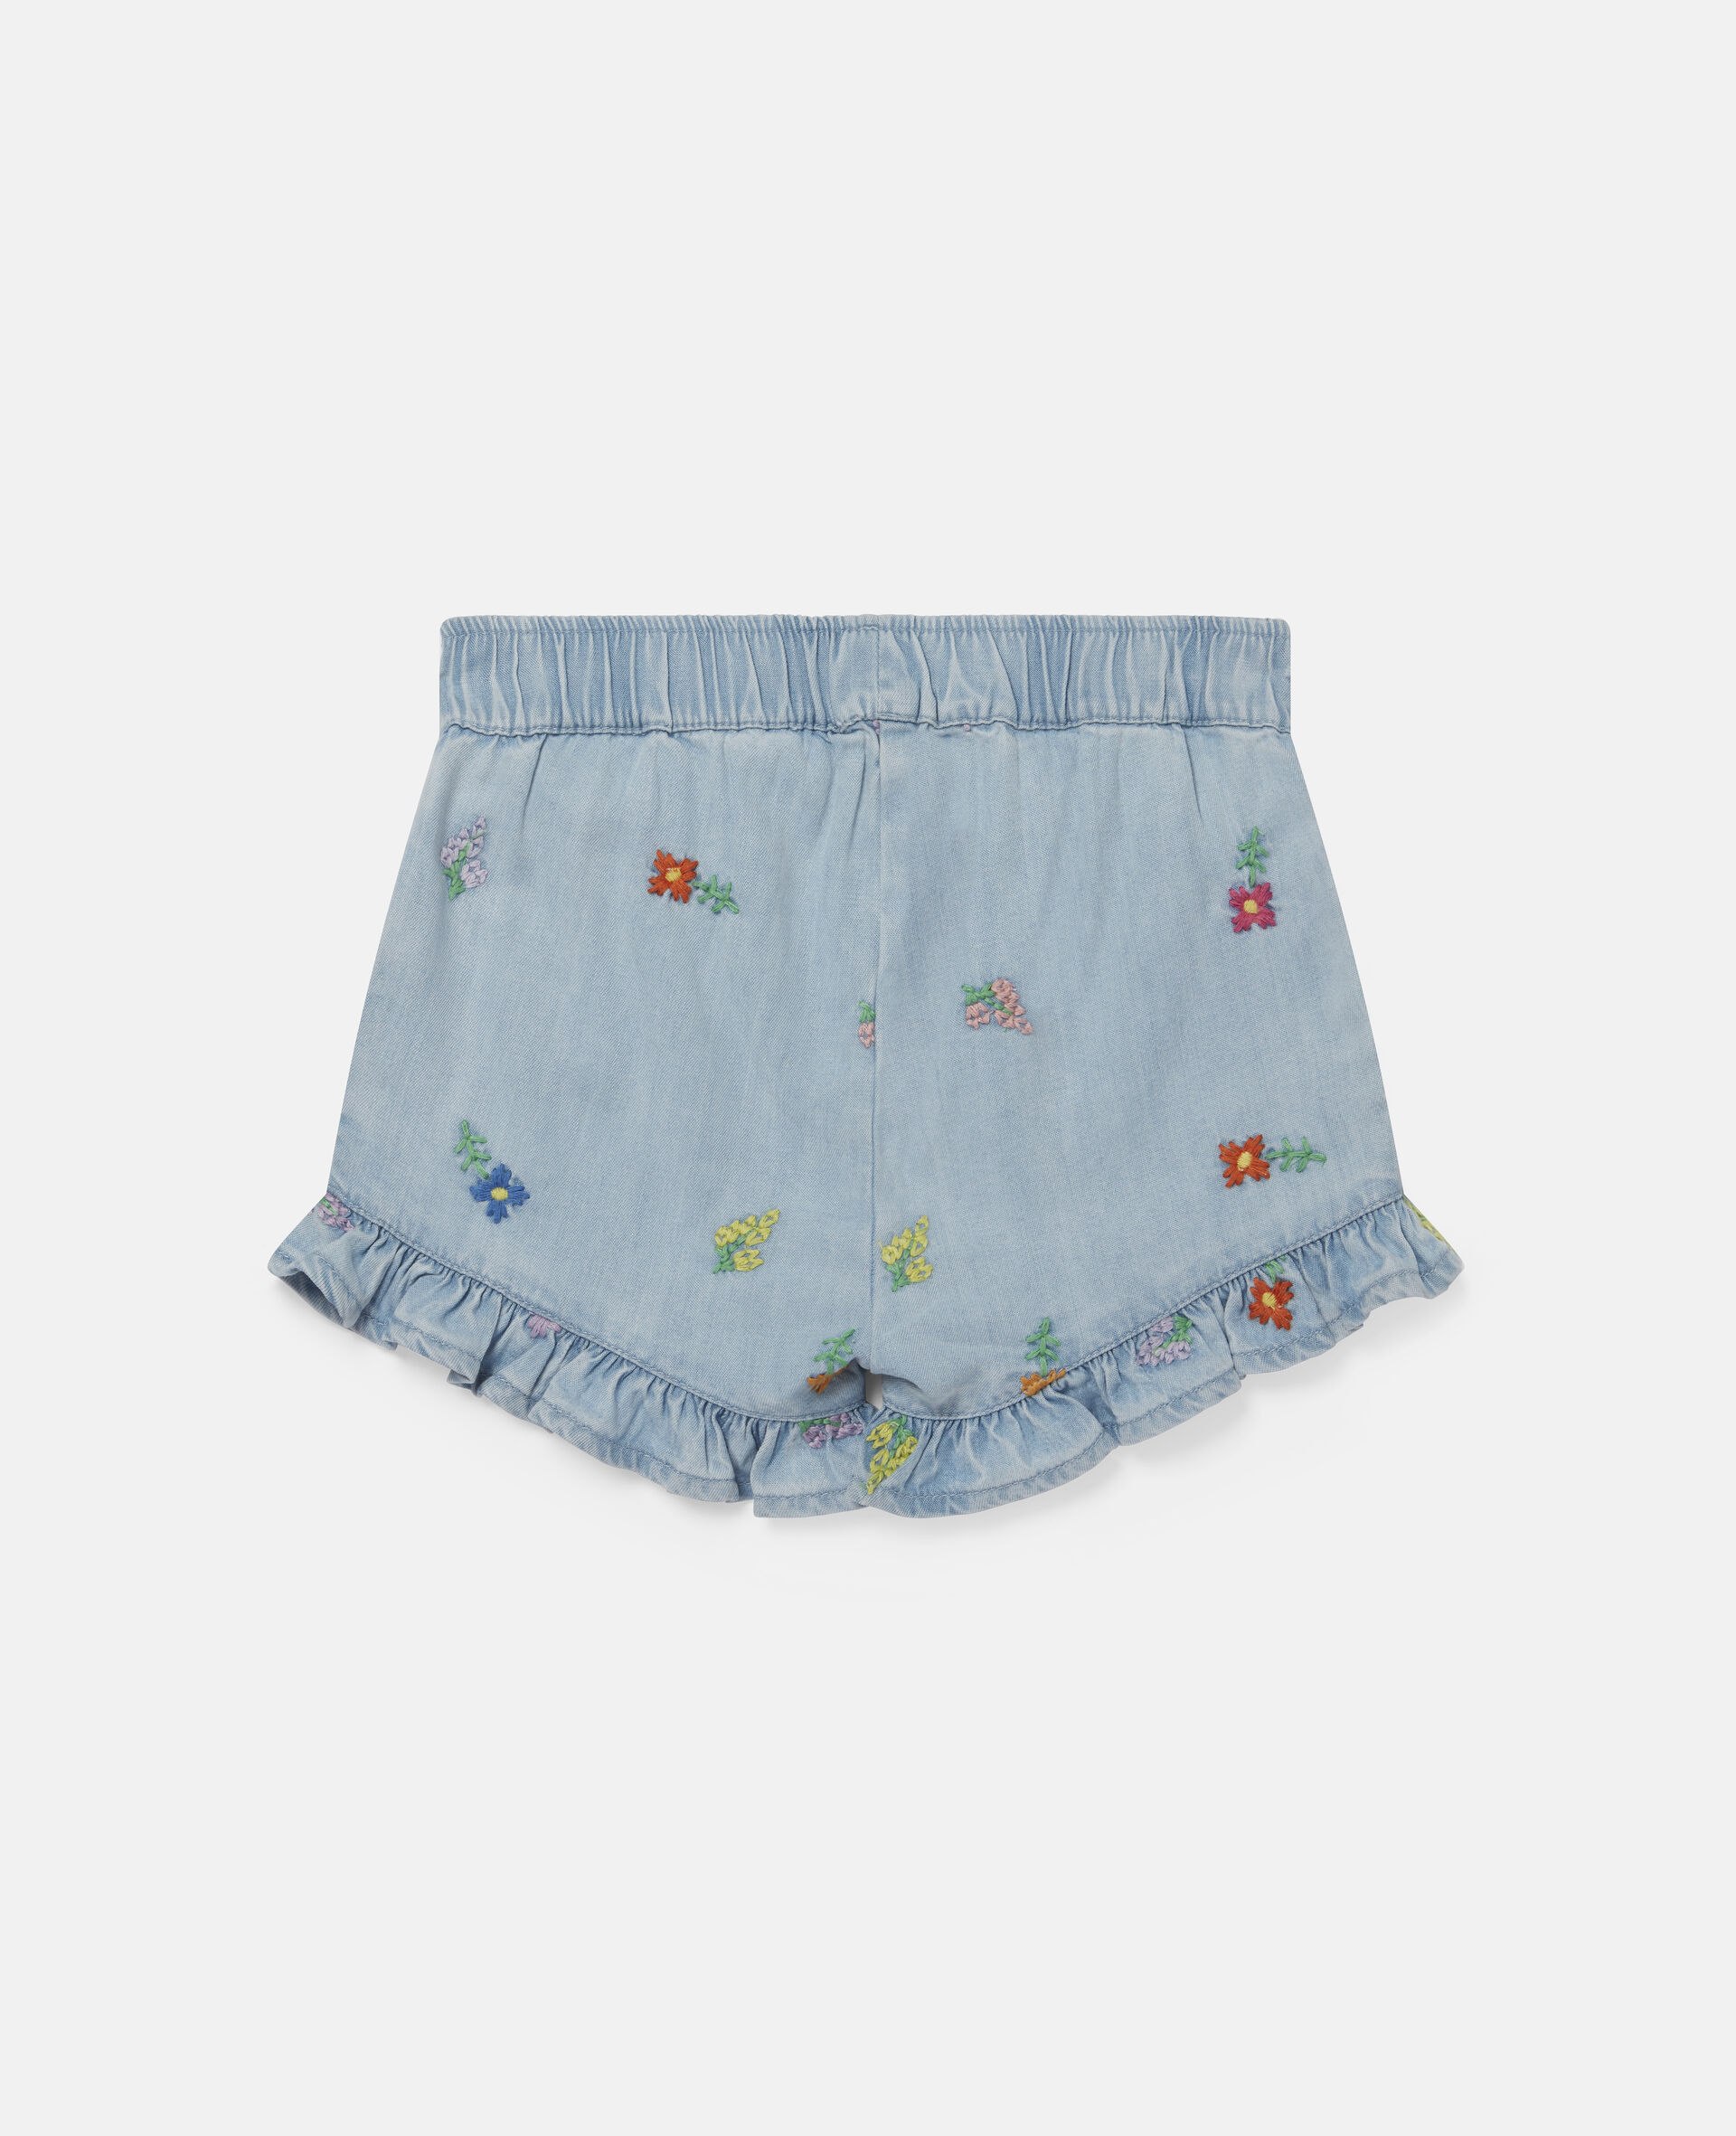 Embroidered Flowers Denim Shorts-Blue-large image number 3